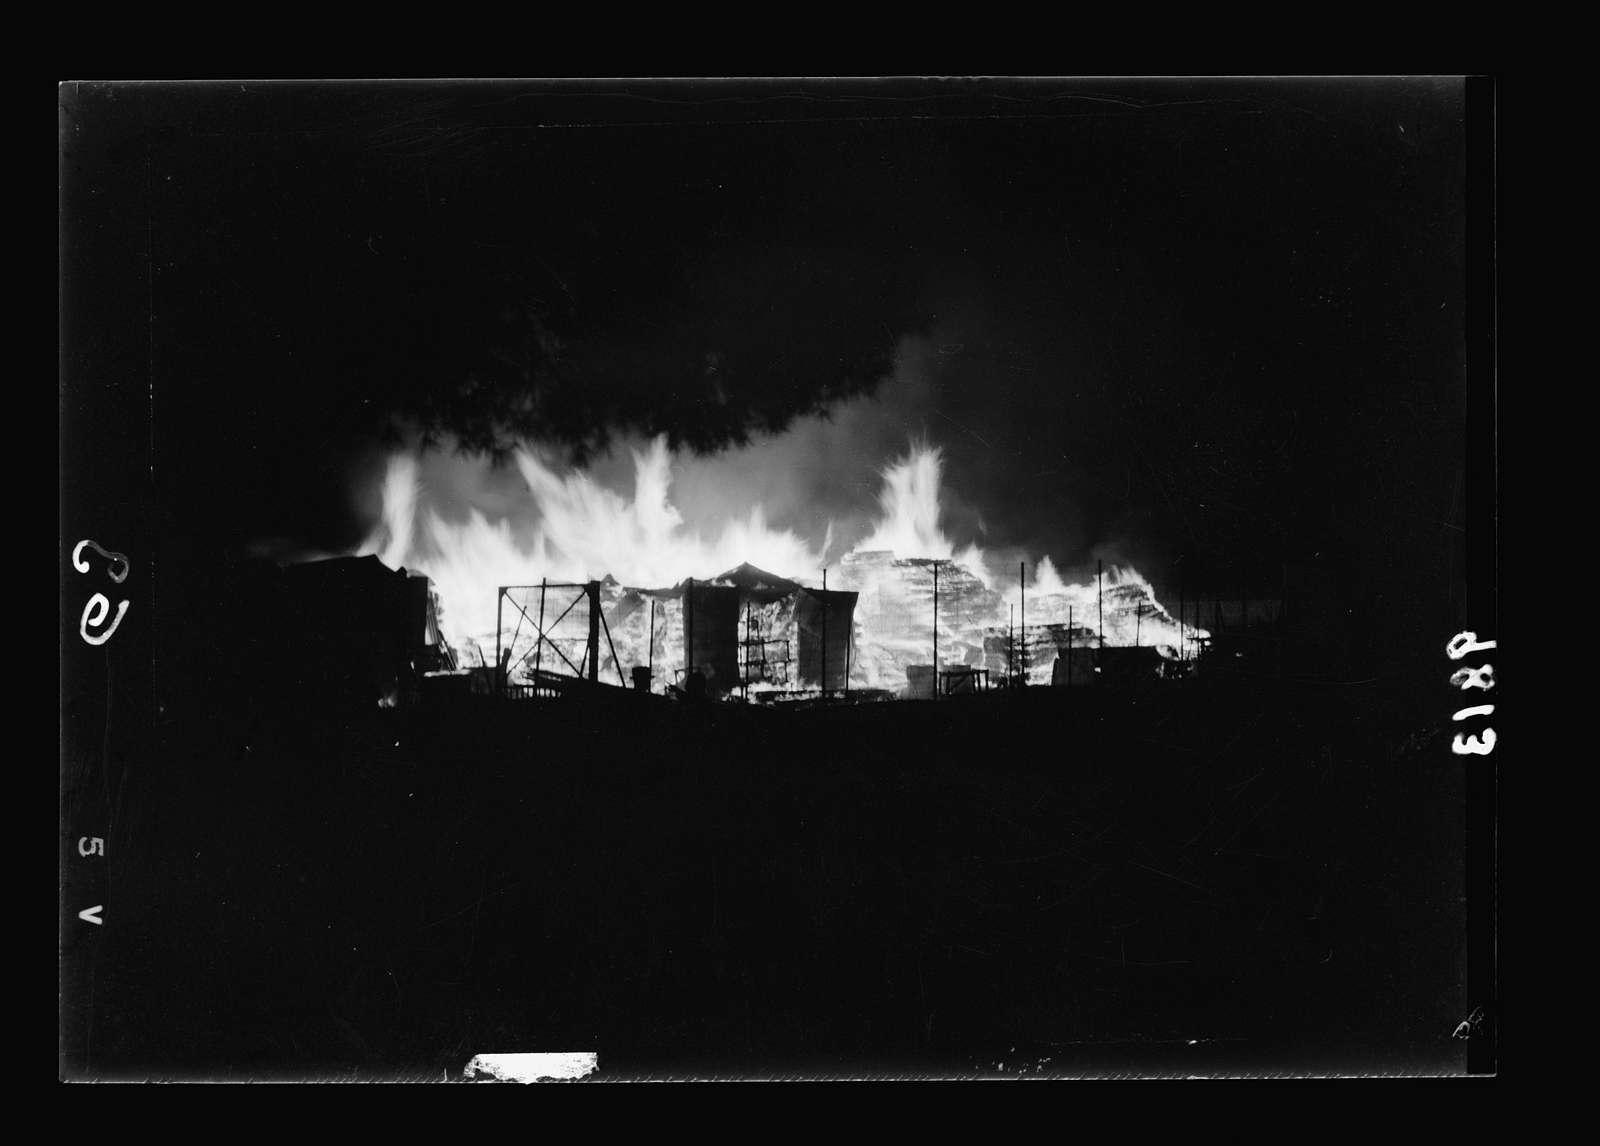 Night incindiary i.e., incendiary of coal and lumber yards near railroad station